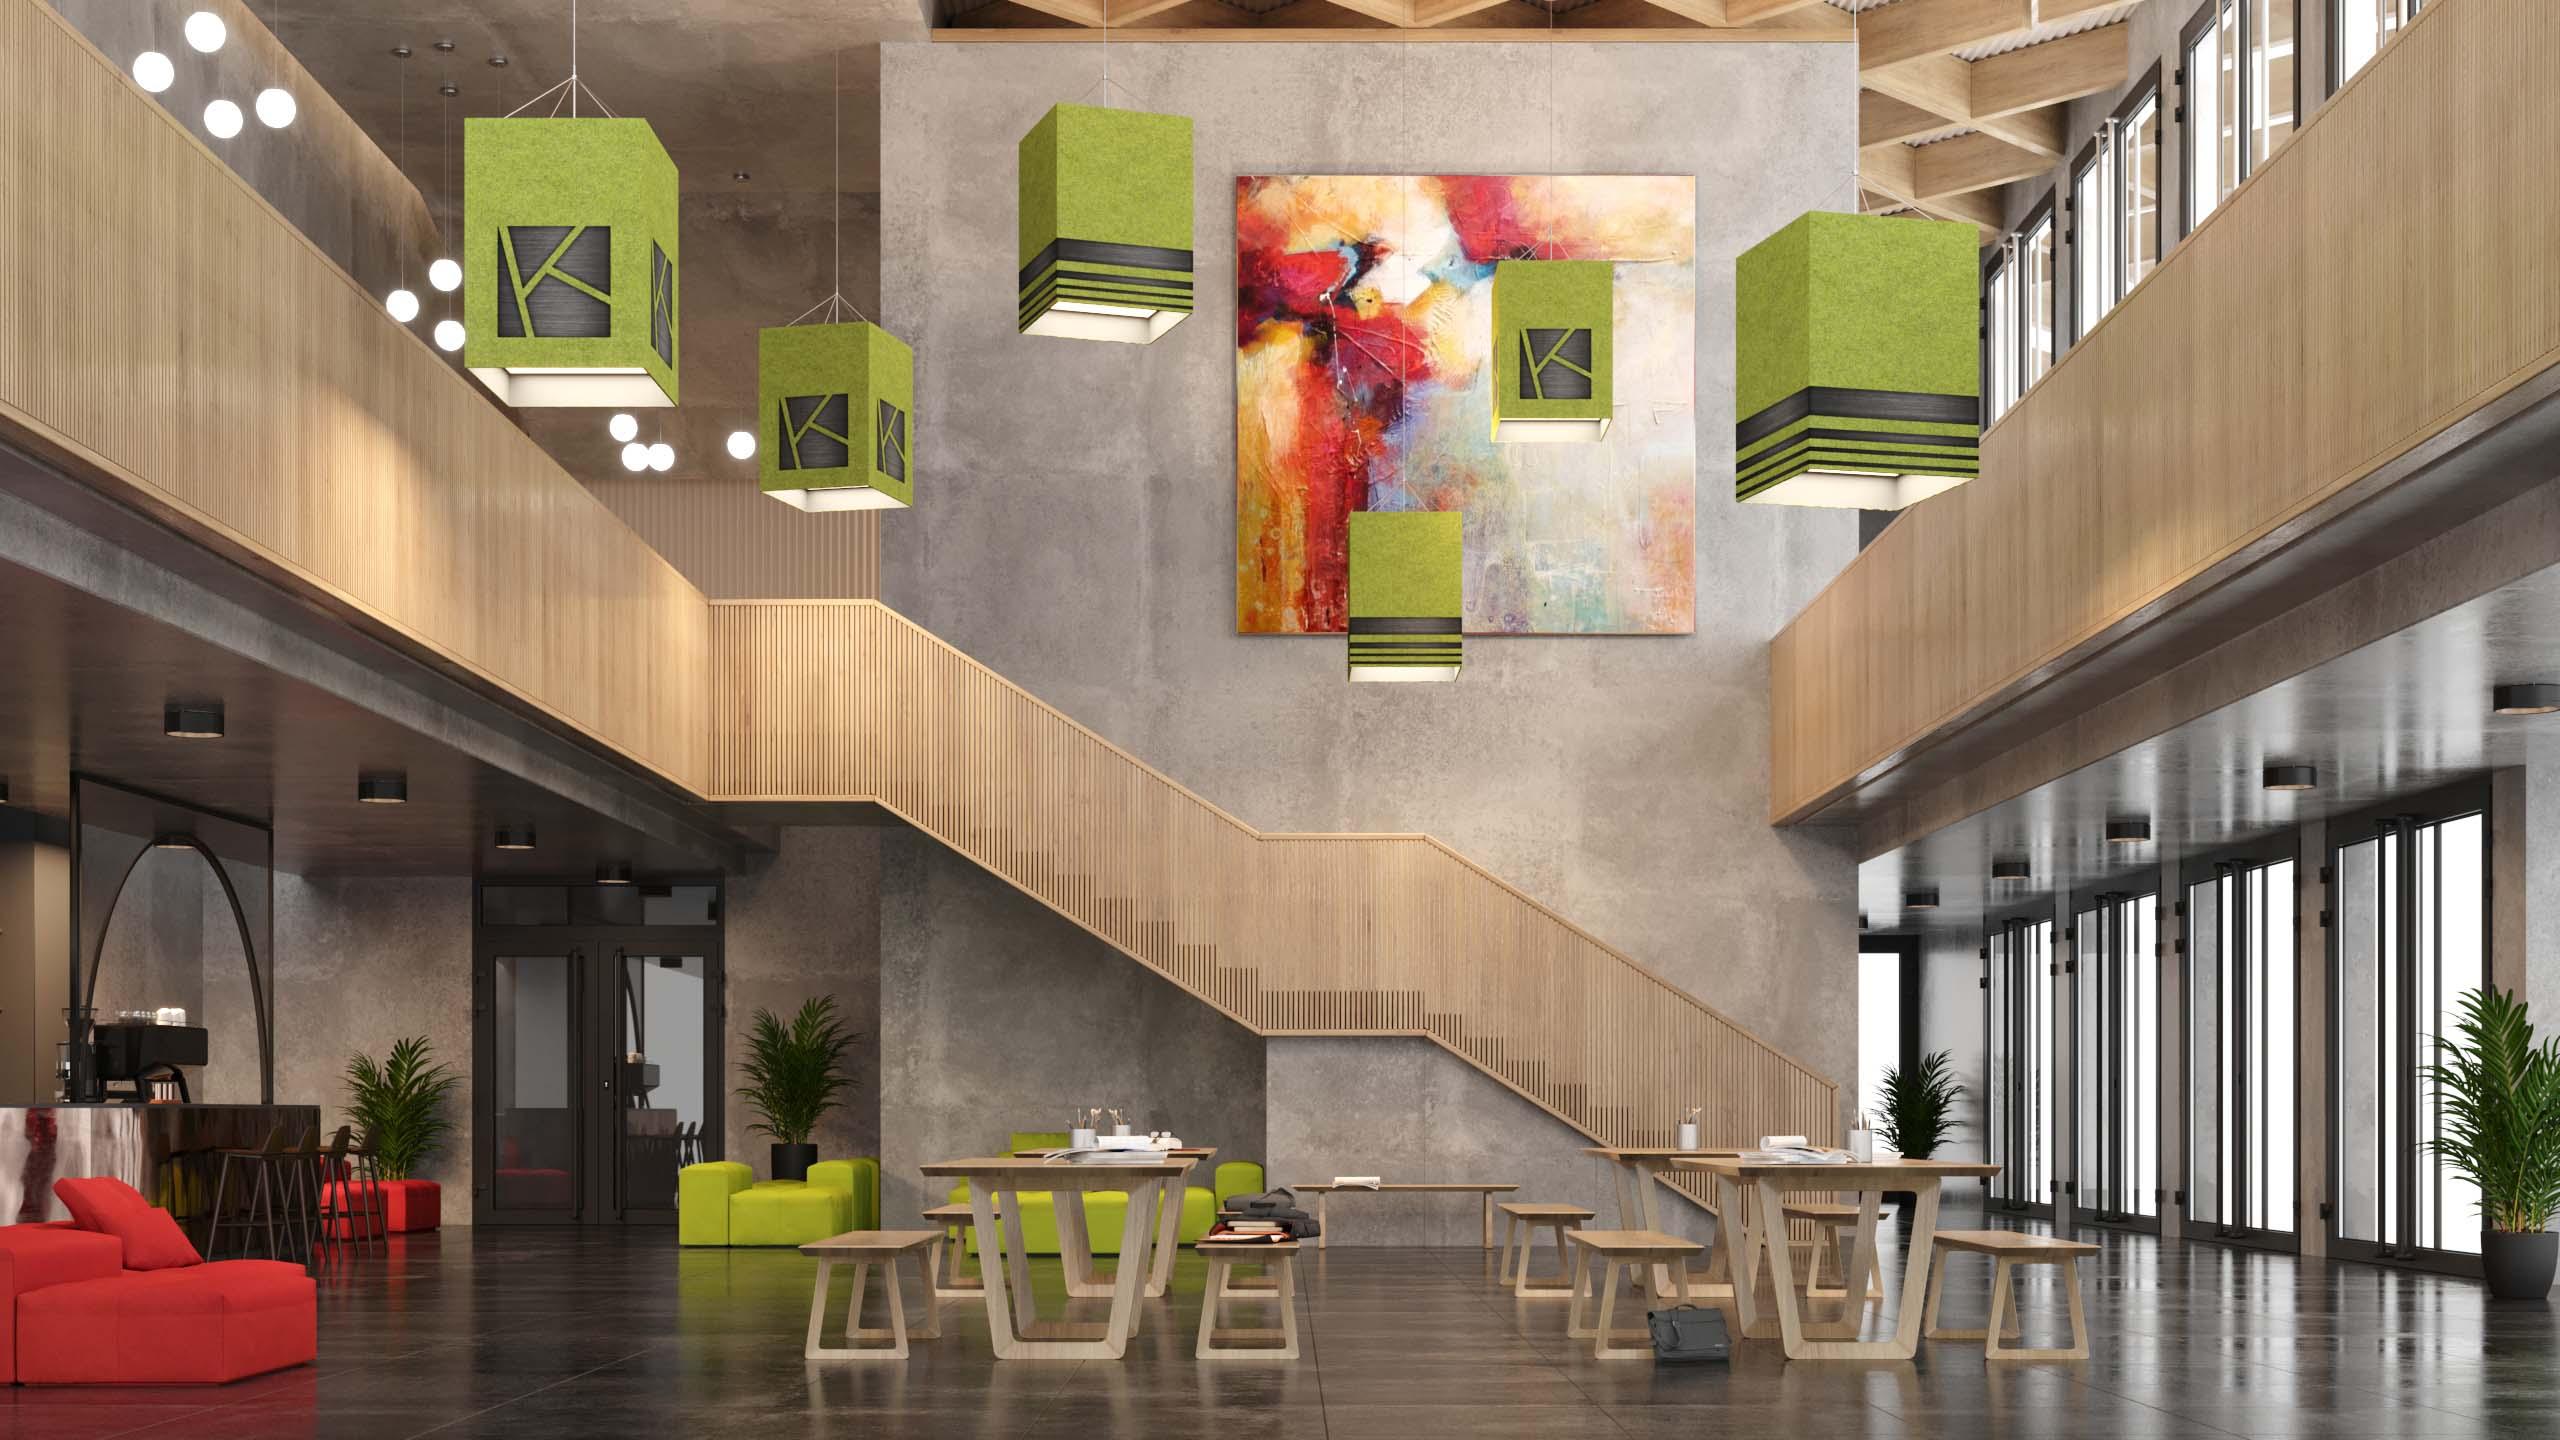 Modern pendant lighting from Visa Lighting for commercial architectural interiors.